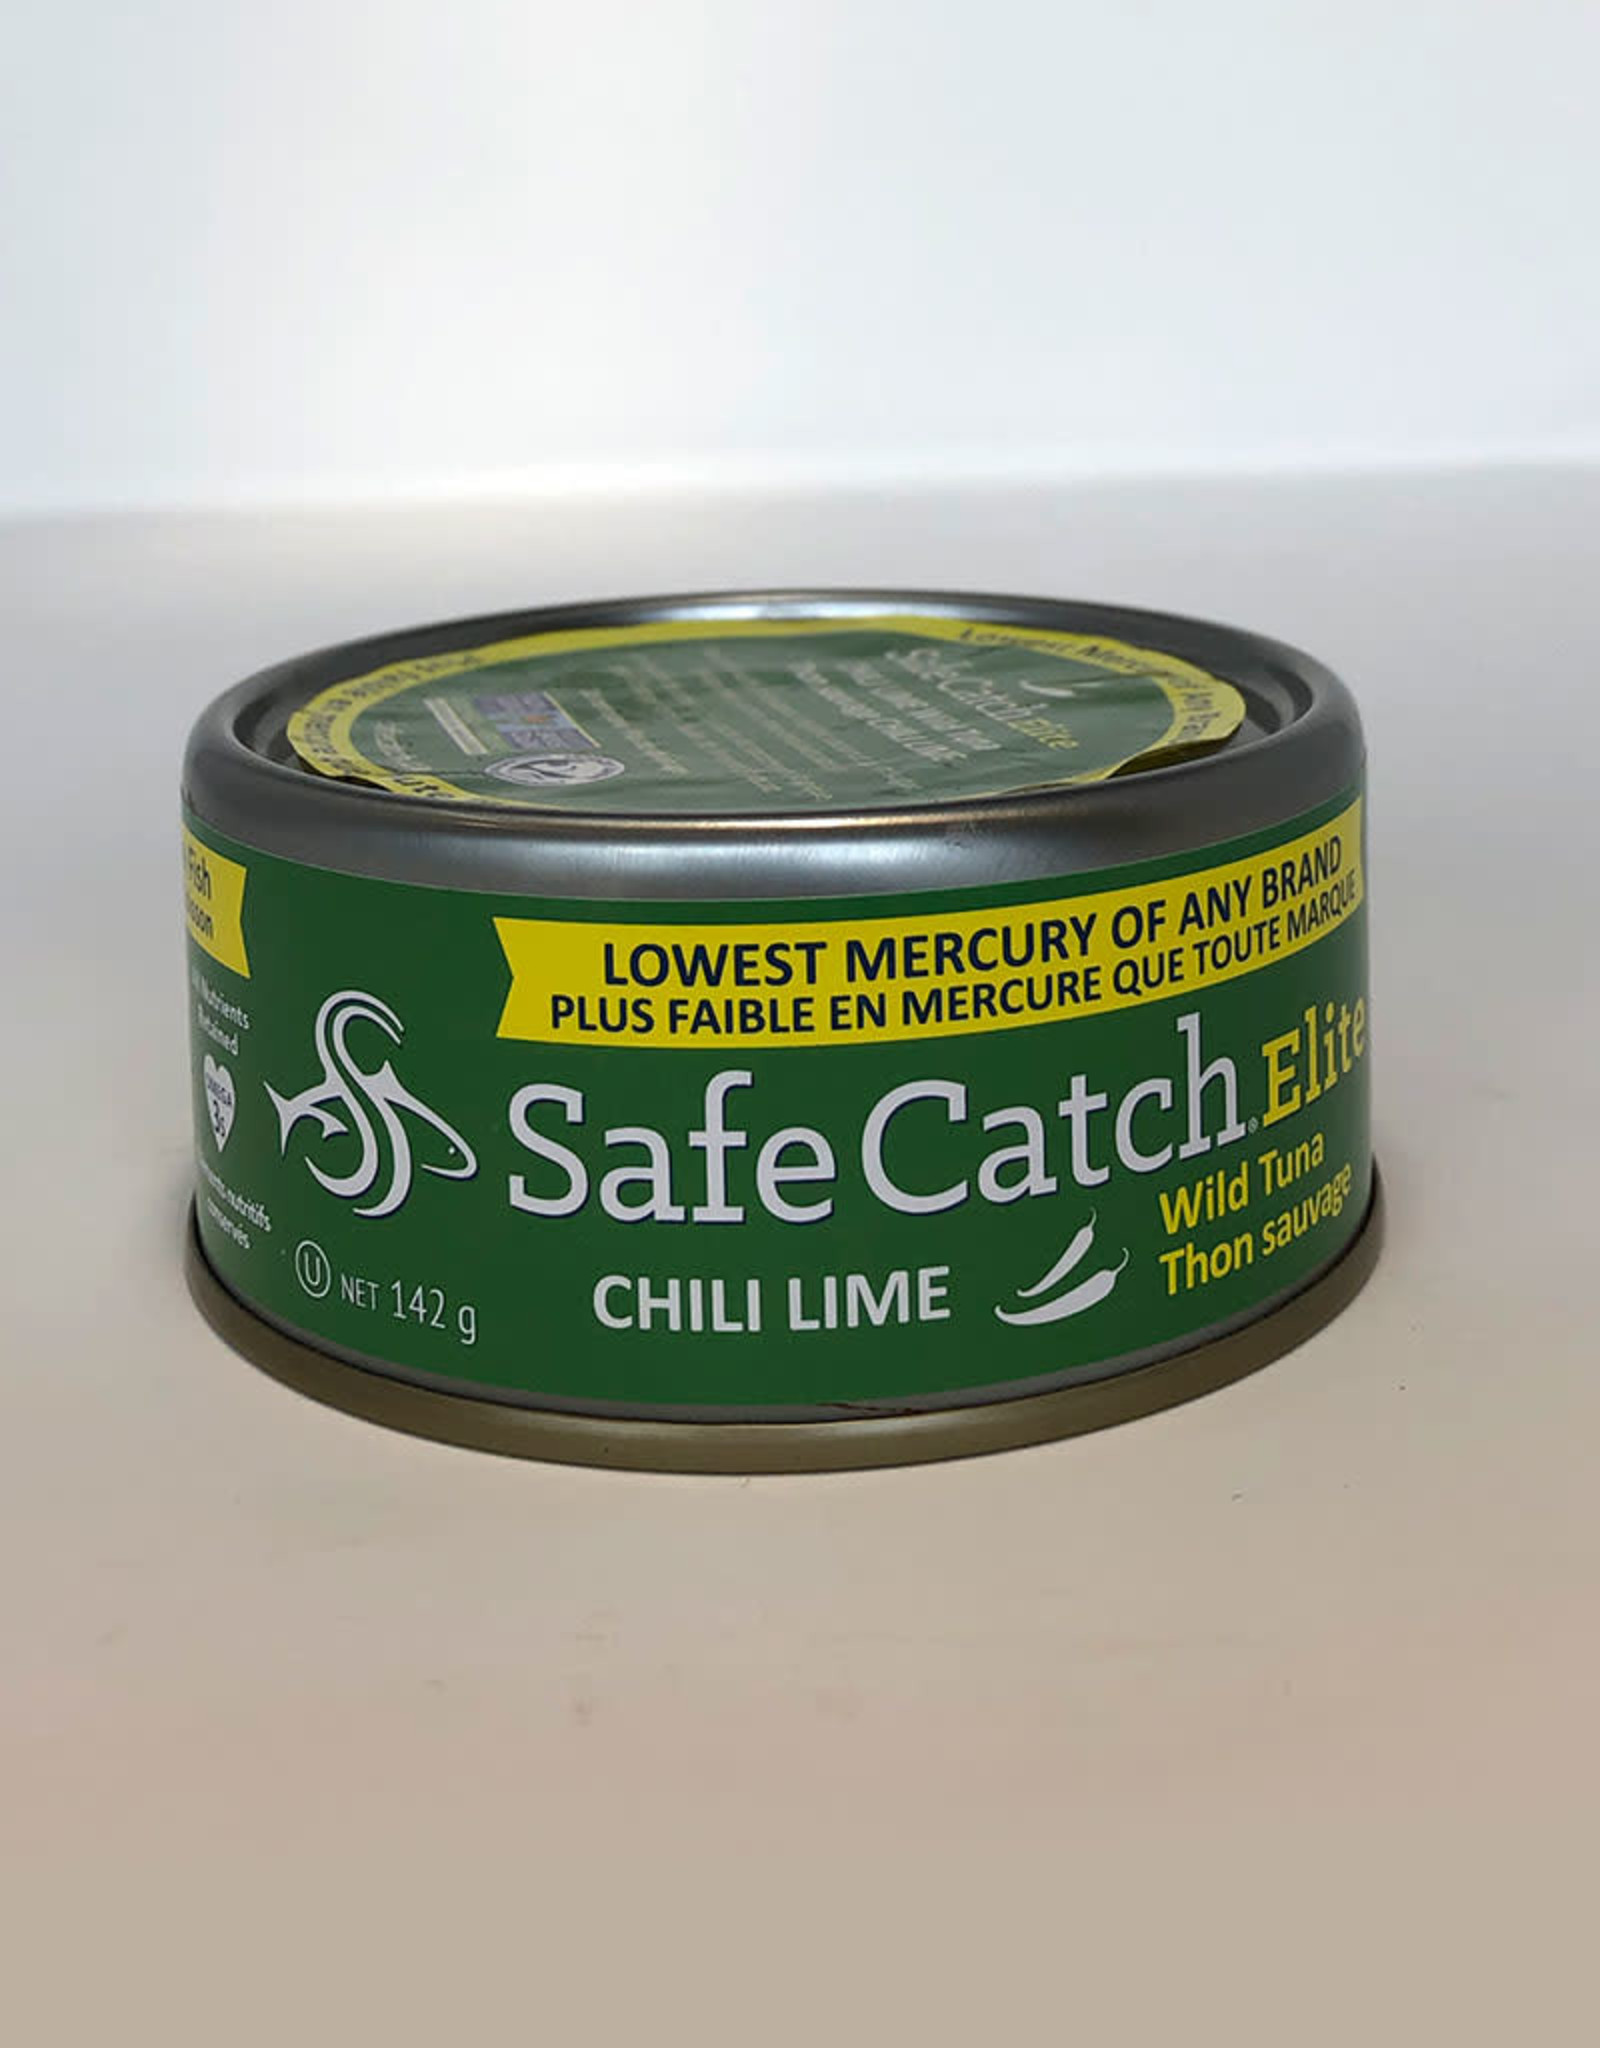 Safe Catch Safe Catch - Elite Wild Tuna, Chili Lime (142g)